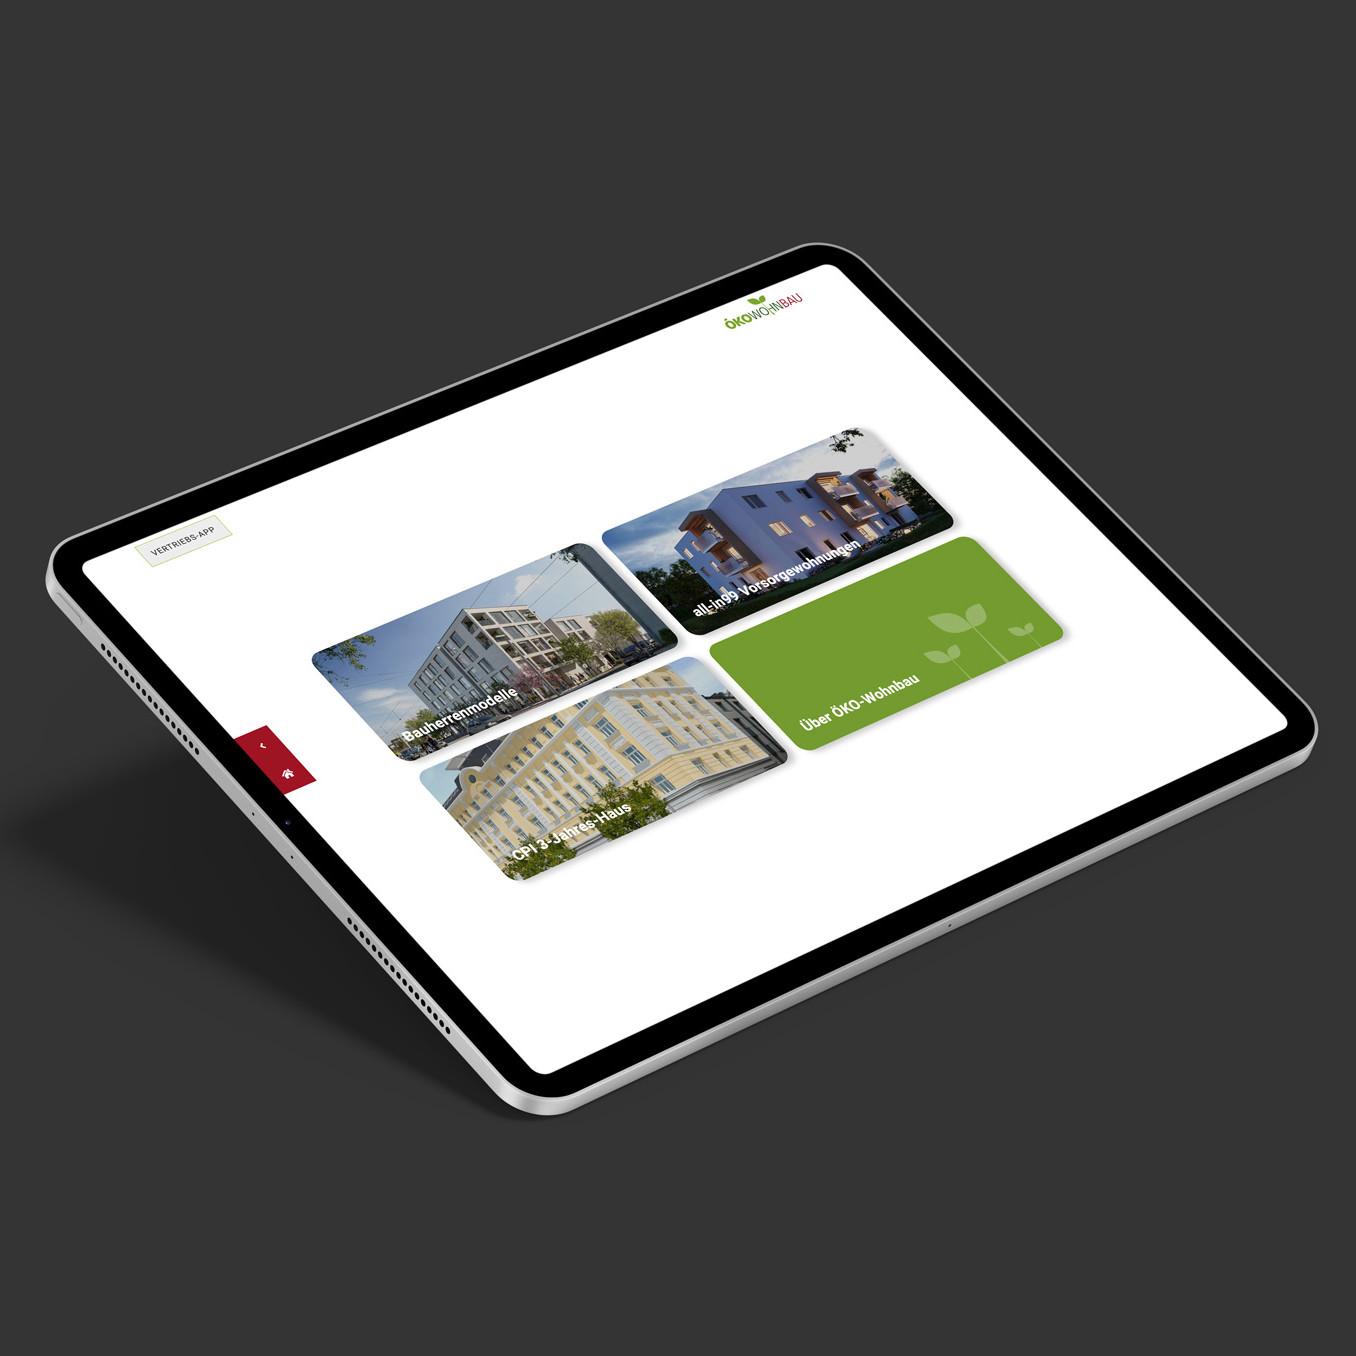 Tablett Öko-Wohnbau Sales-App Startfolie